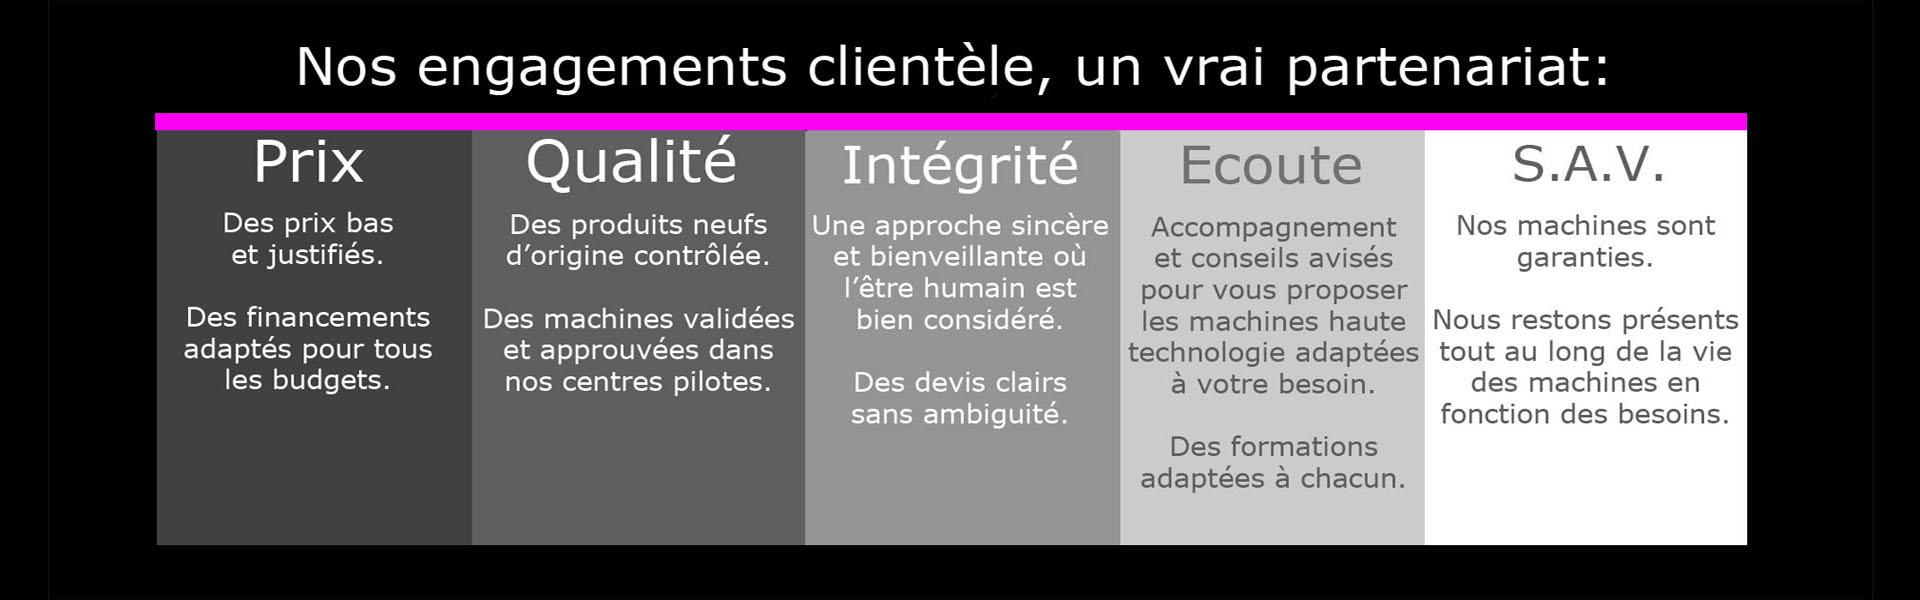 diaporama_accueil_01_engagements_MBS_redim2